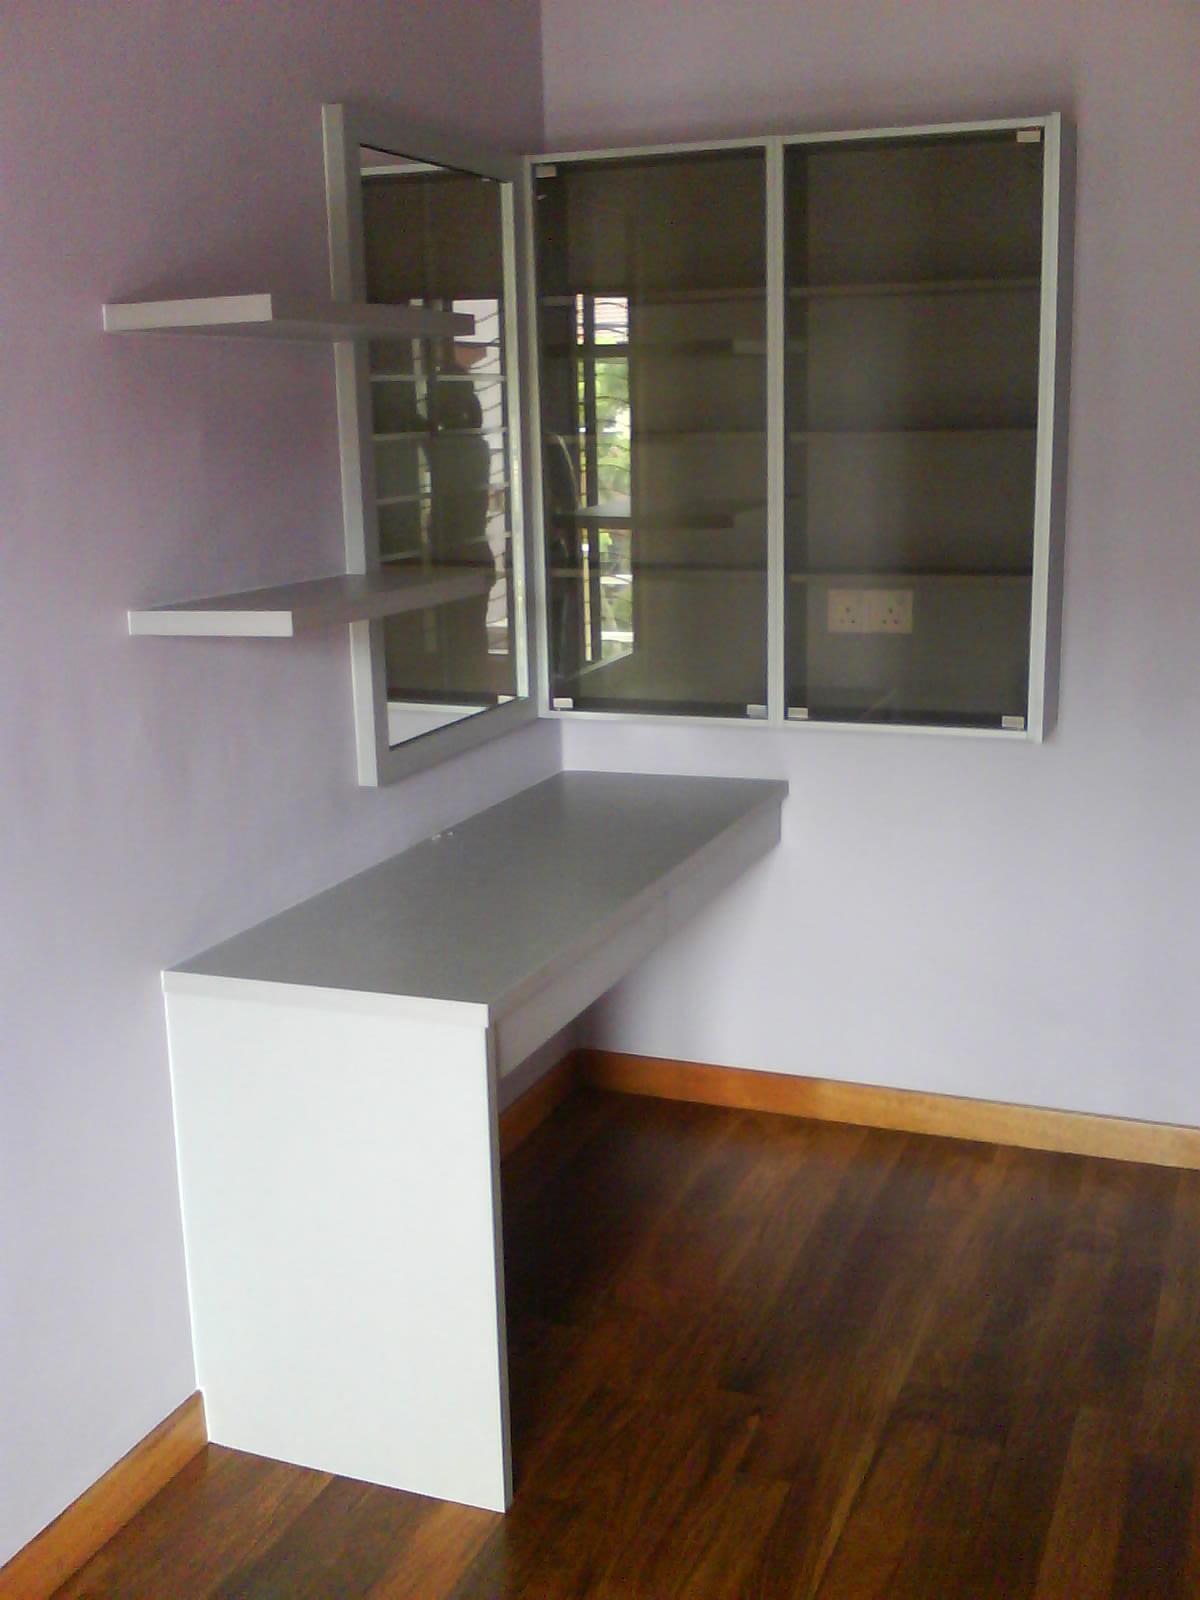 Cabinet Design Kuala Lumpur & Cabinet Design Kuala Lumpur: Puchong cabinet Sliding Door Wardrobe ...